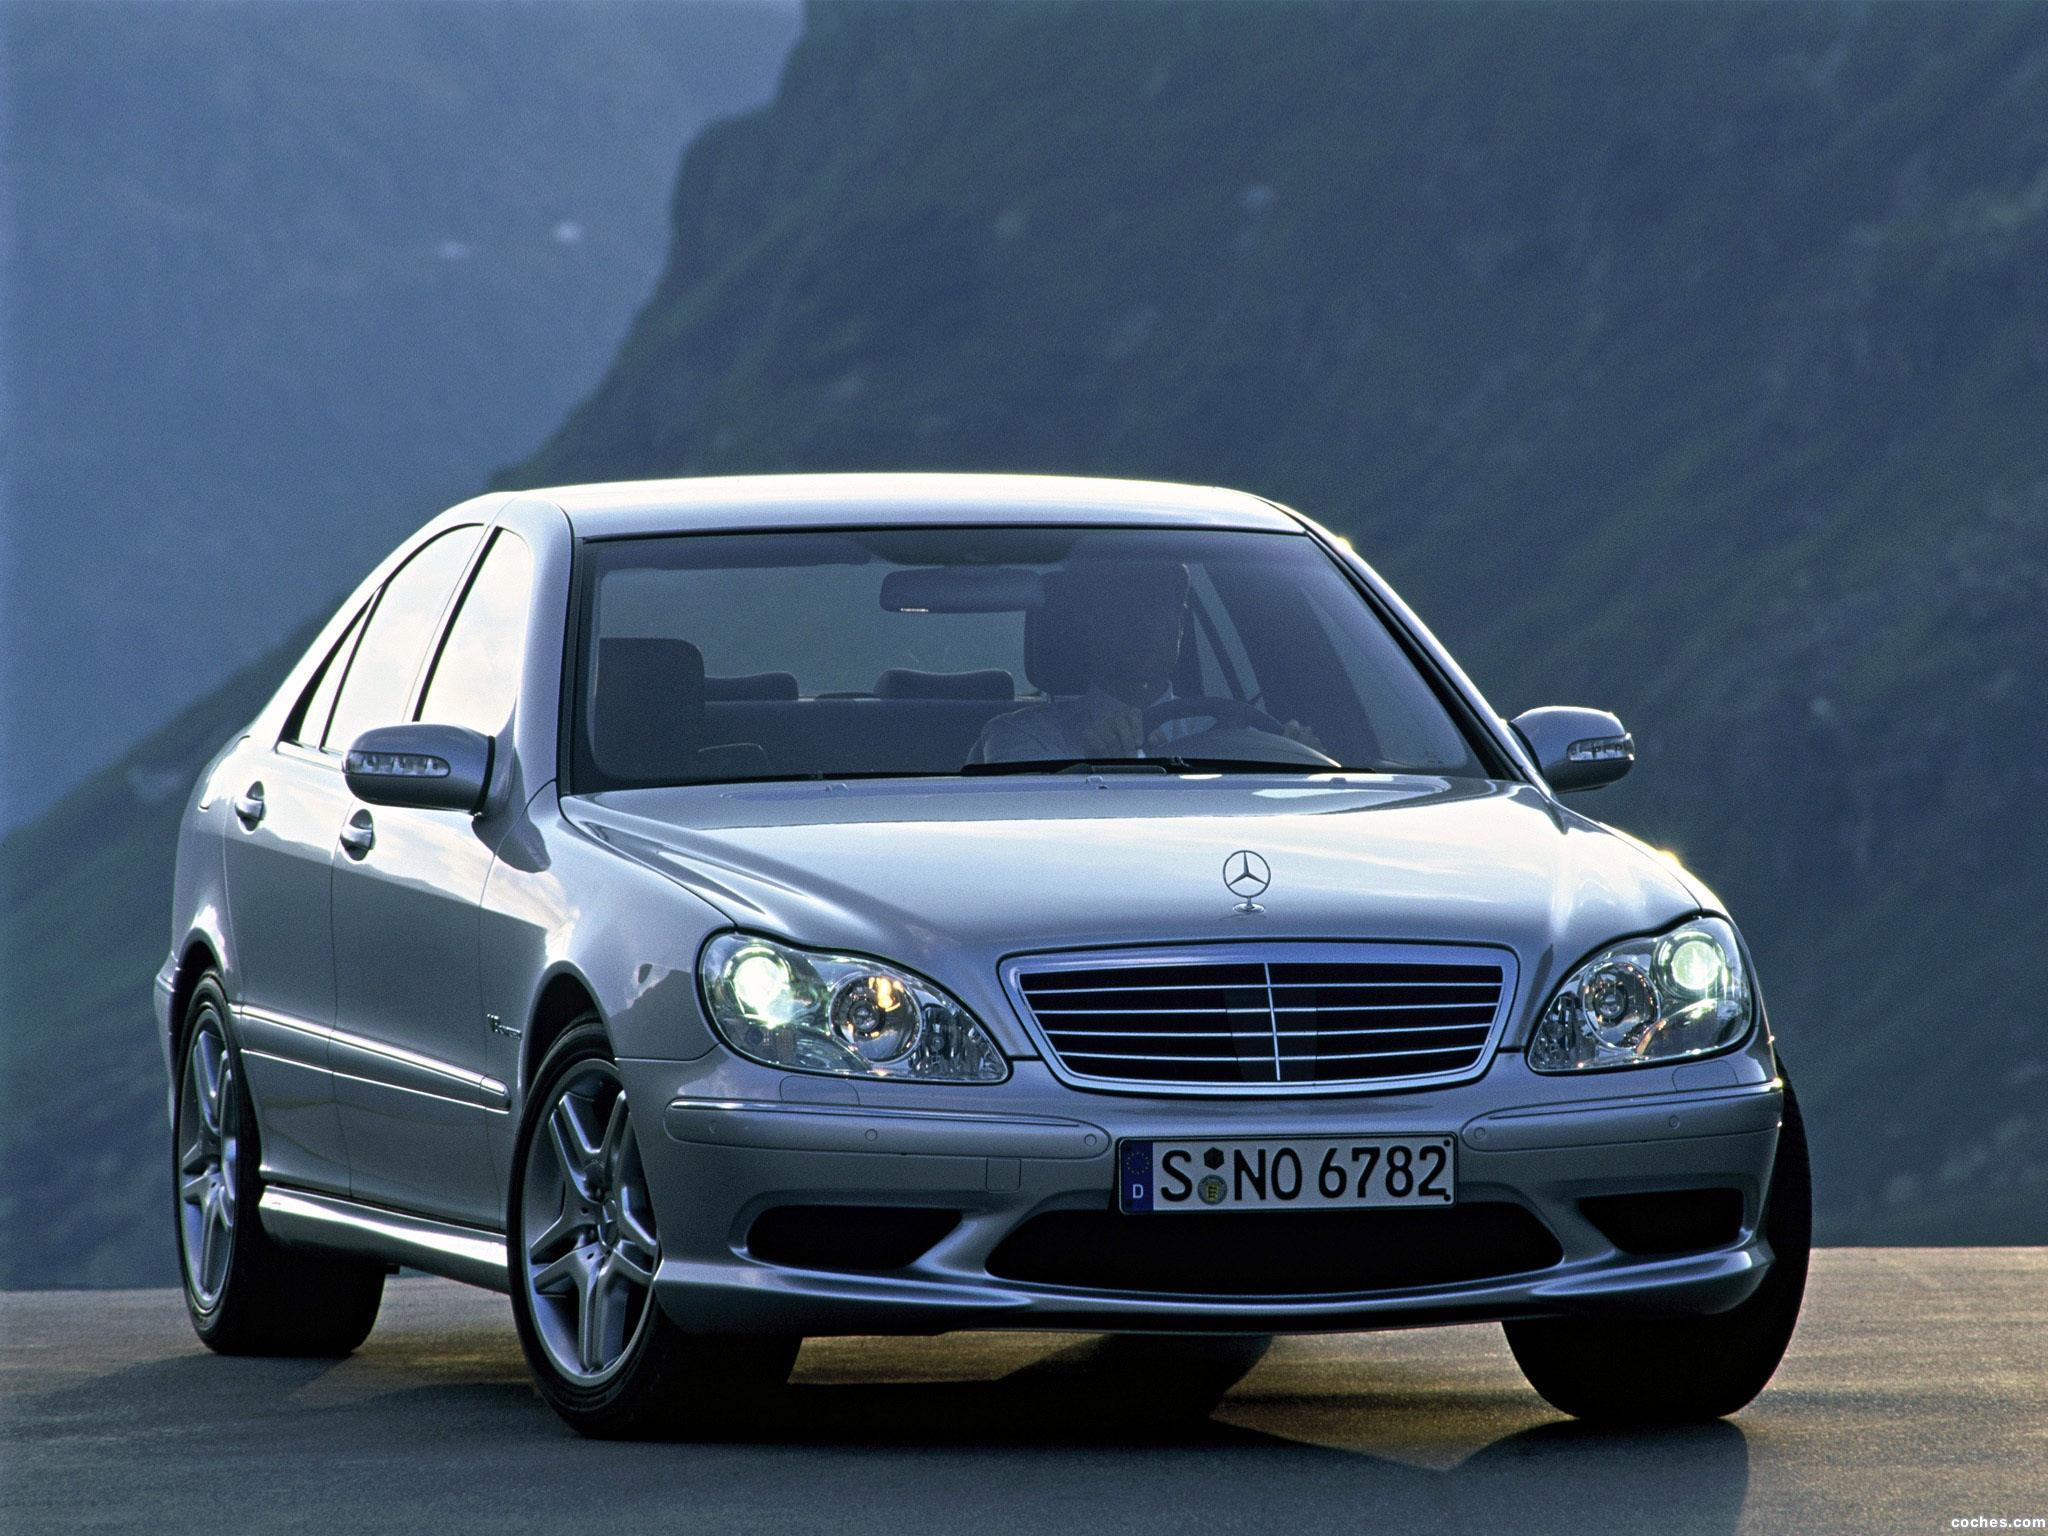 Foto 0 de Mercedes S-Klasse S55 AMG W220 2002